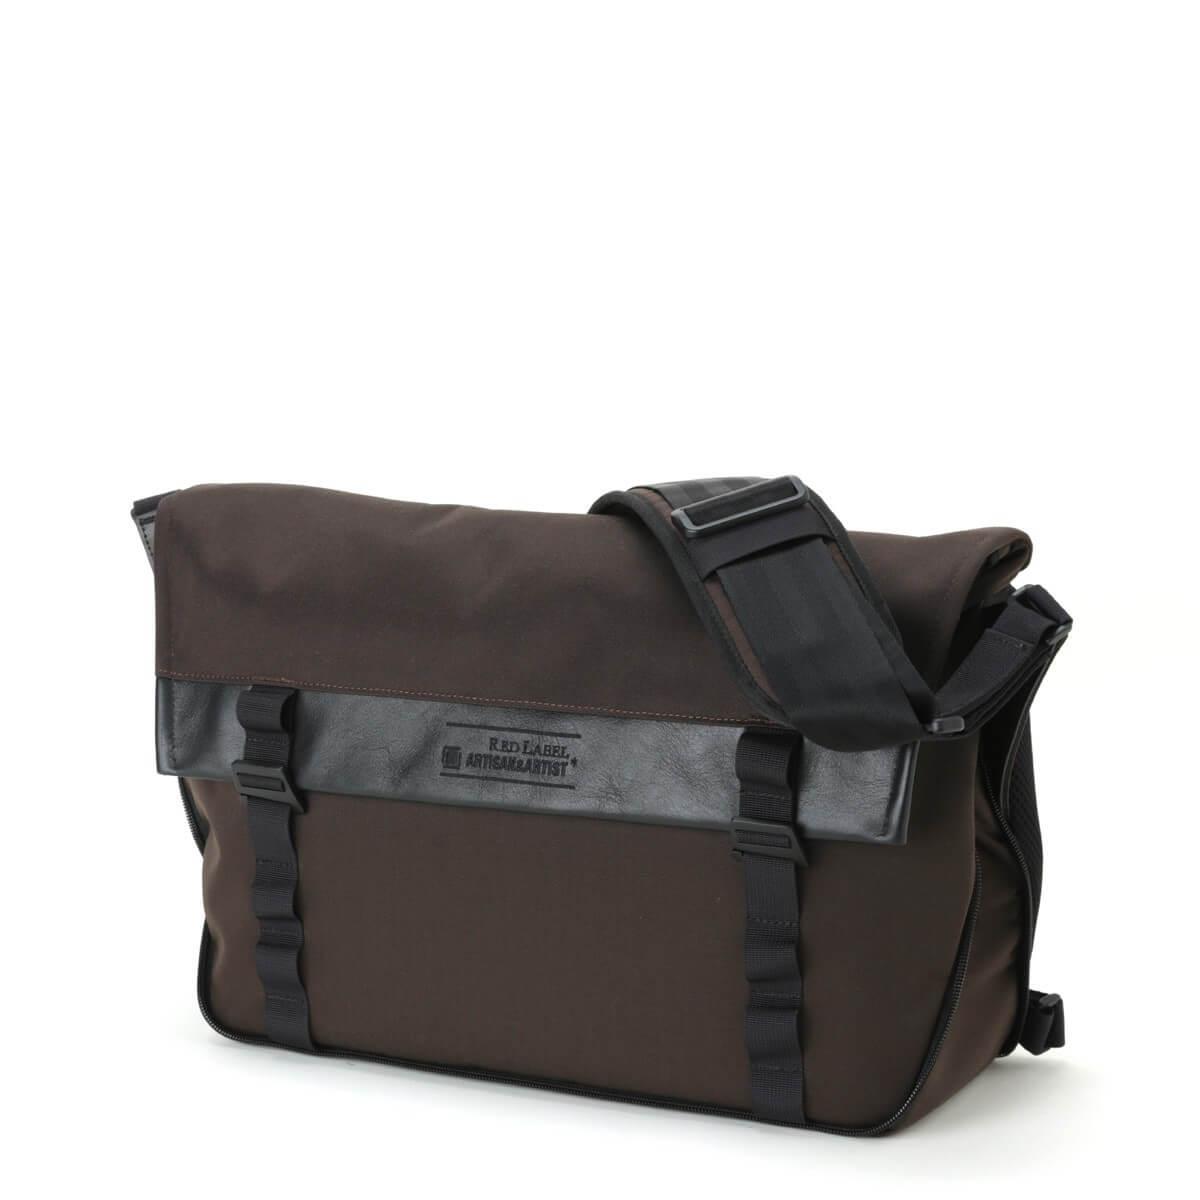 Artisan Artist RDB MG300 Messenger Bag 4